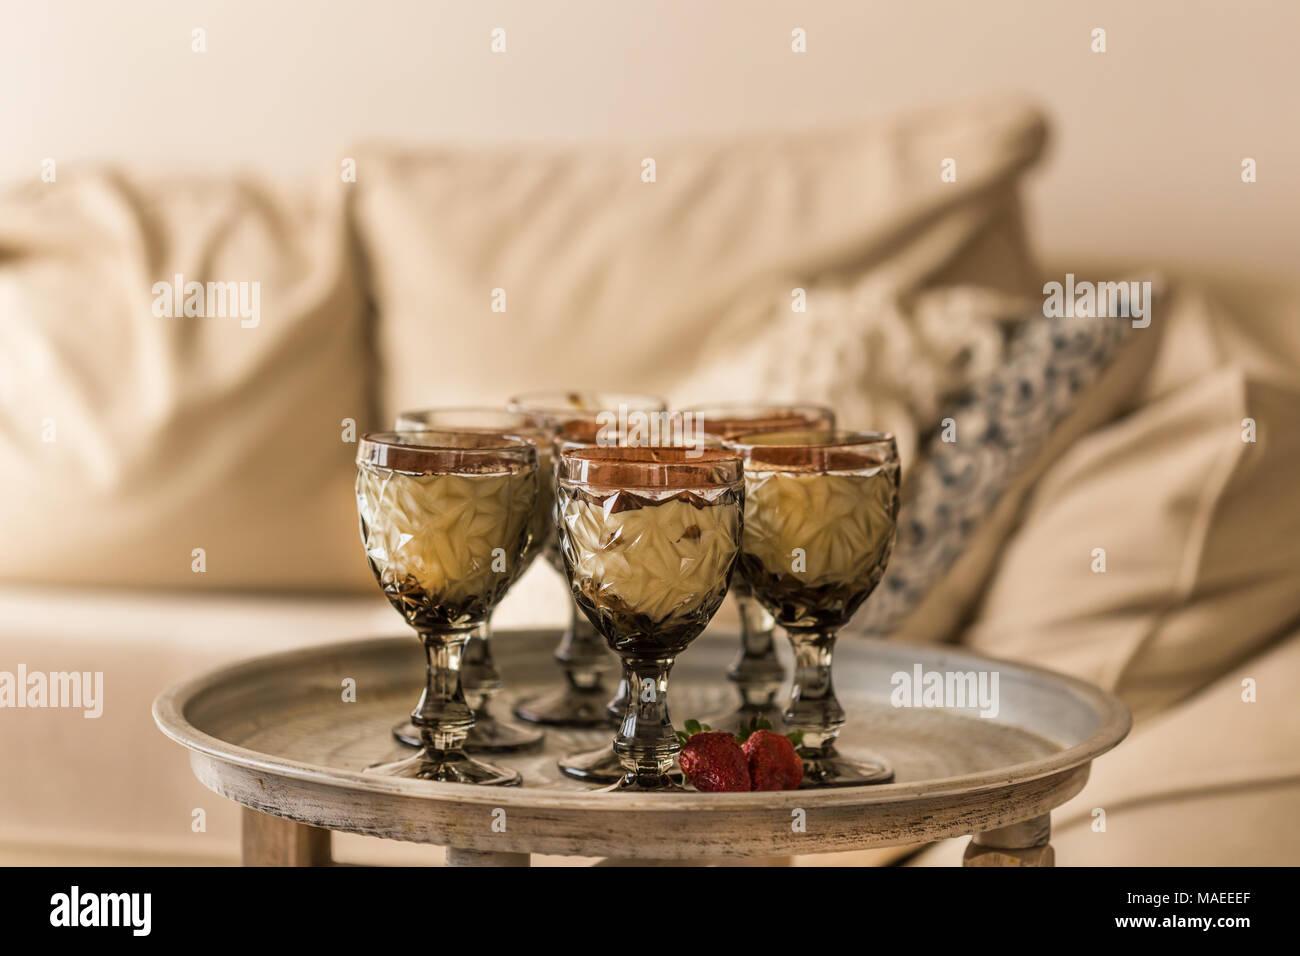 Tiramisu in elegant glasses on round metal table in beige interior.  Horizontal composition.  Narrow depth of field. - Stock Image